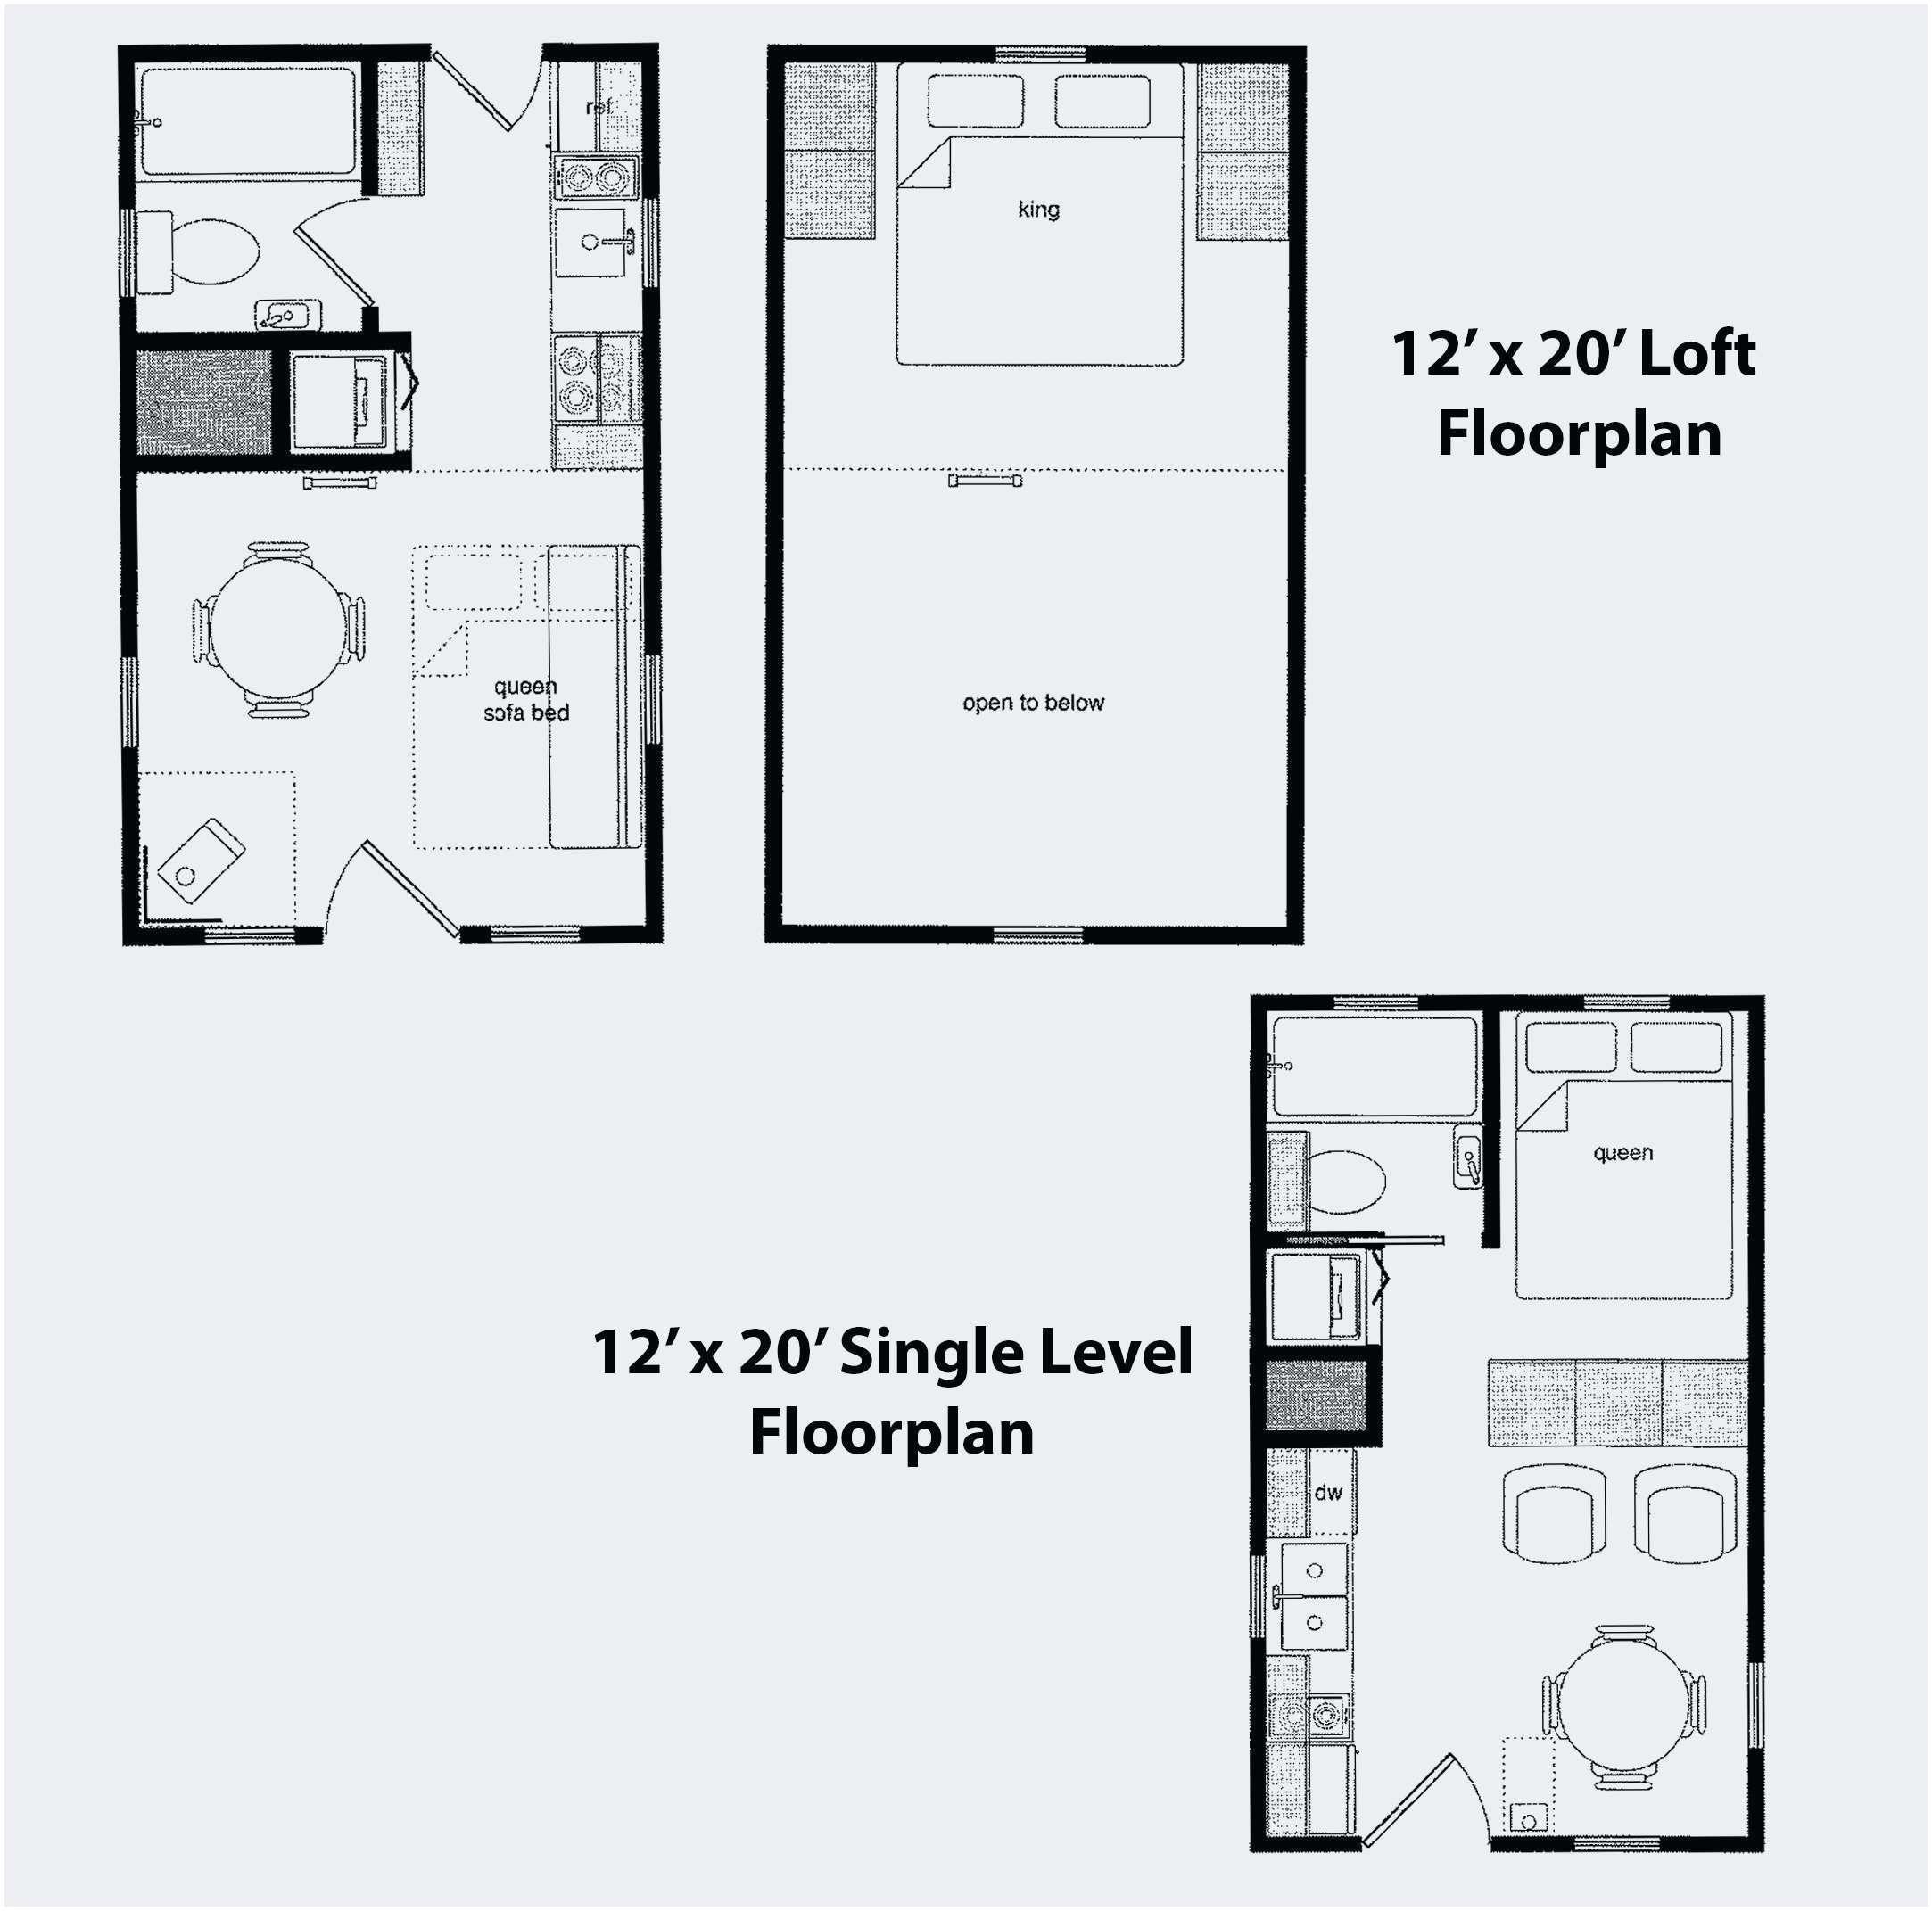 Fresh 12x24 Tiny House Plans Best 12x24 Tiny House Plans Awesome 12 24 For Alternative 12x16 Tiny Hou Loft Floor Plans Cabin Floor Plans Tiny House Floor Plans